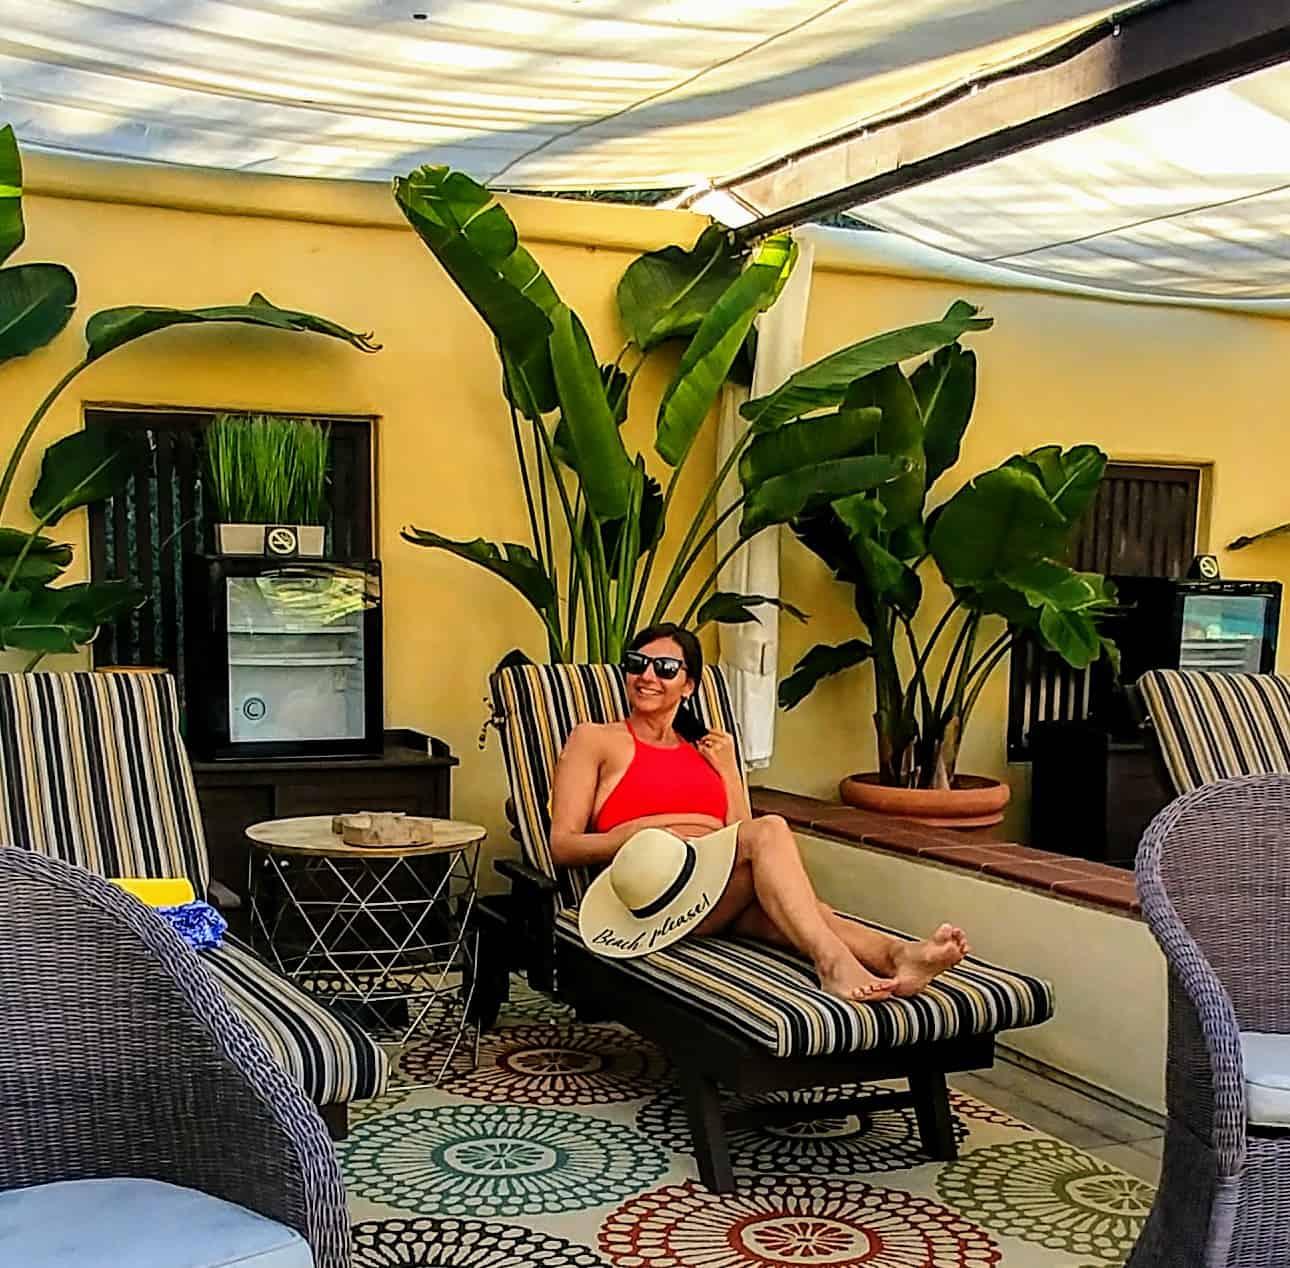 Estancia La Jolla Resort & Spa -A Hacienda Style Hotel